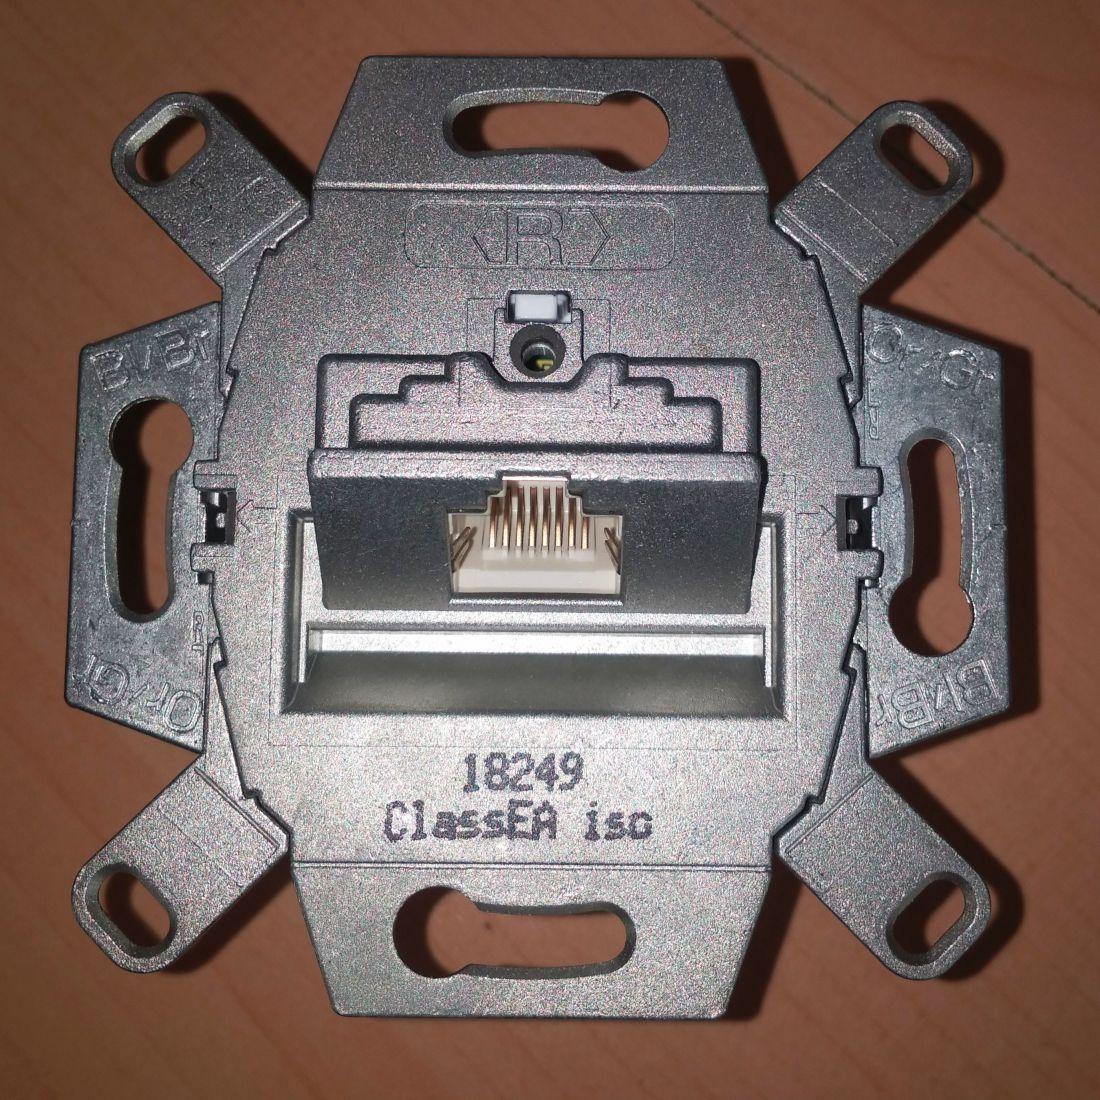 Розетка компьютерная одинарная RJ 45 6 ре